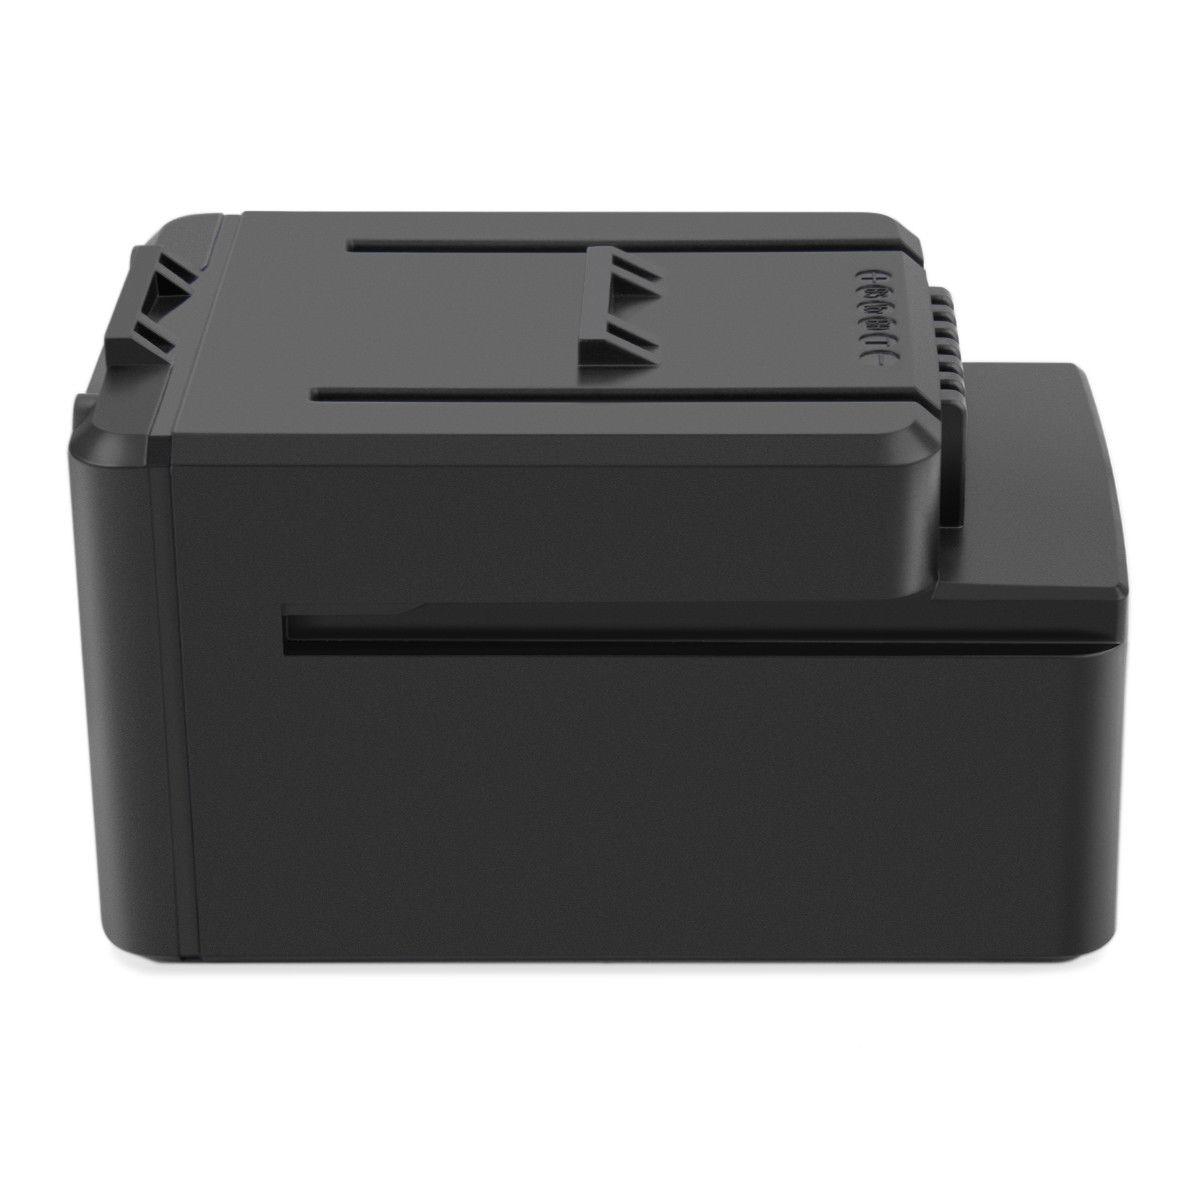 Batterie 40V 3.0AH Lithium Worx WA3536 WA3734 WG268E WG568 WG568E WG168 WG168E(compatible)